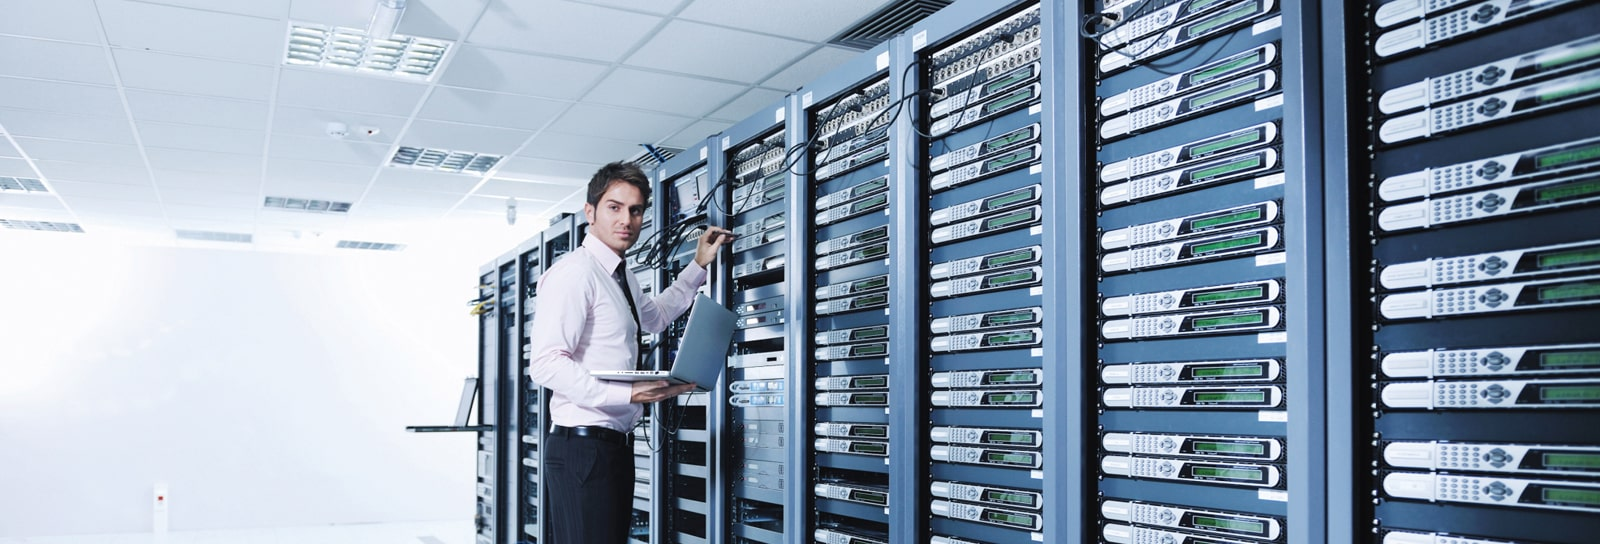 VPS management services